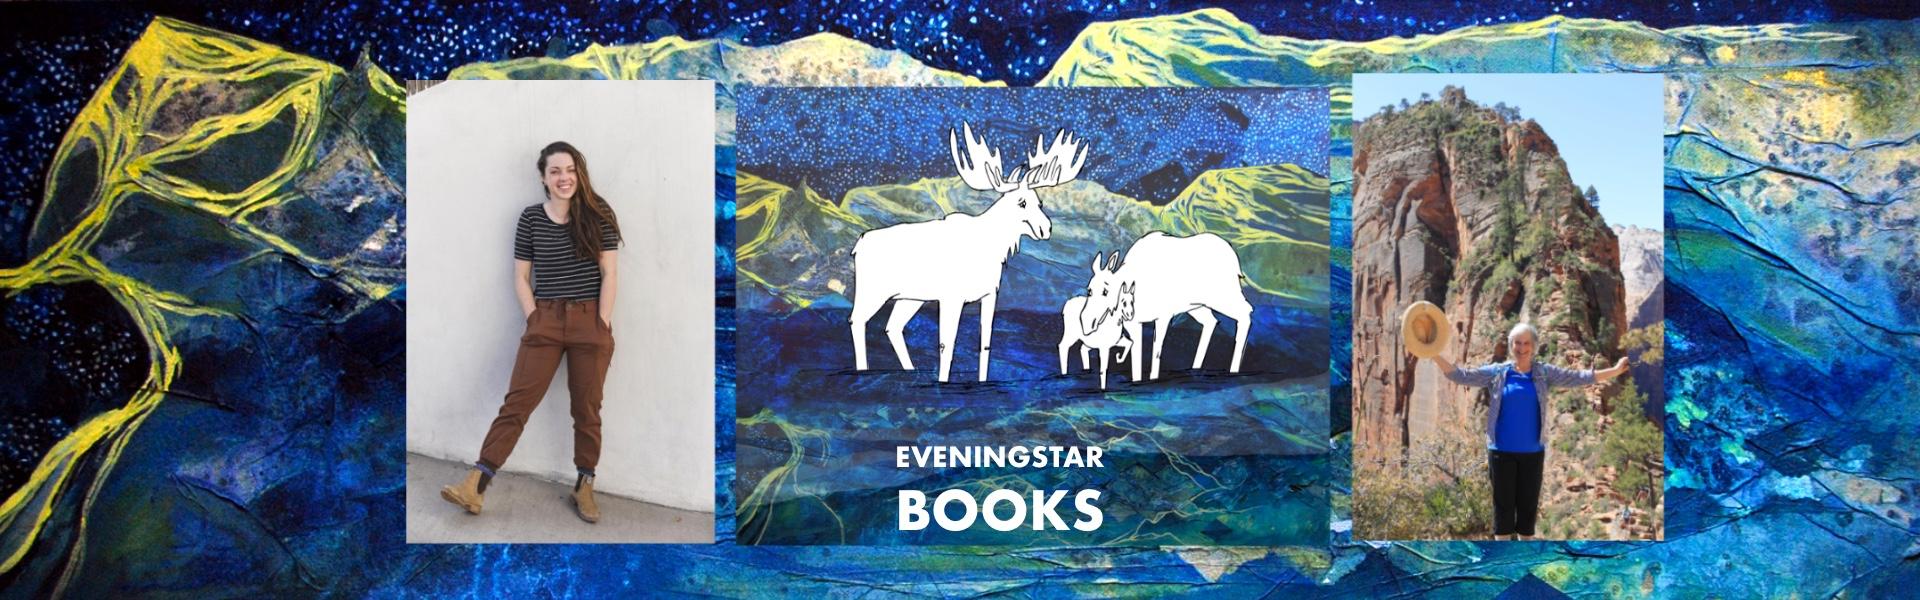 Evening Star Books